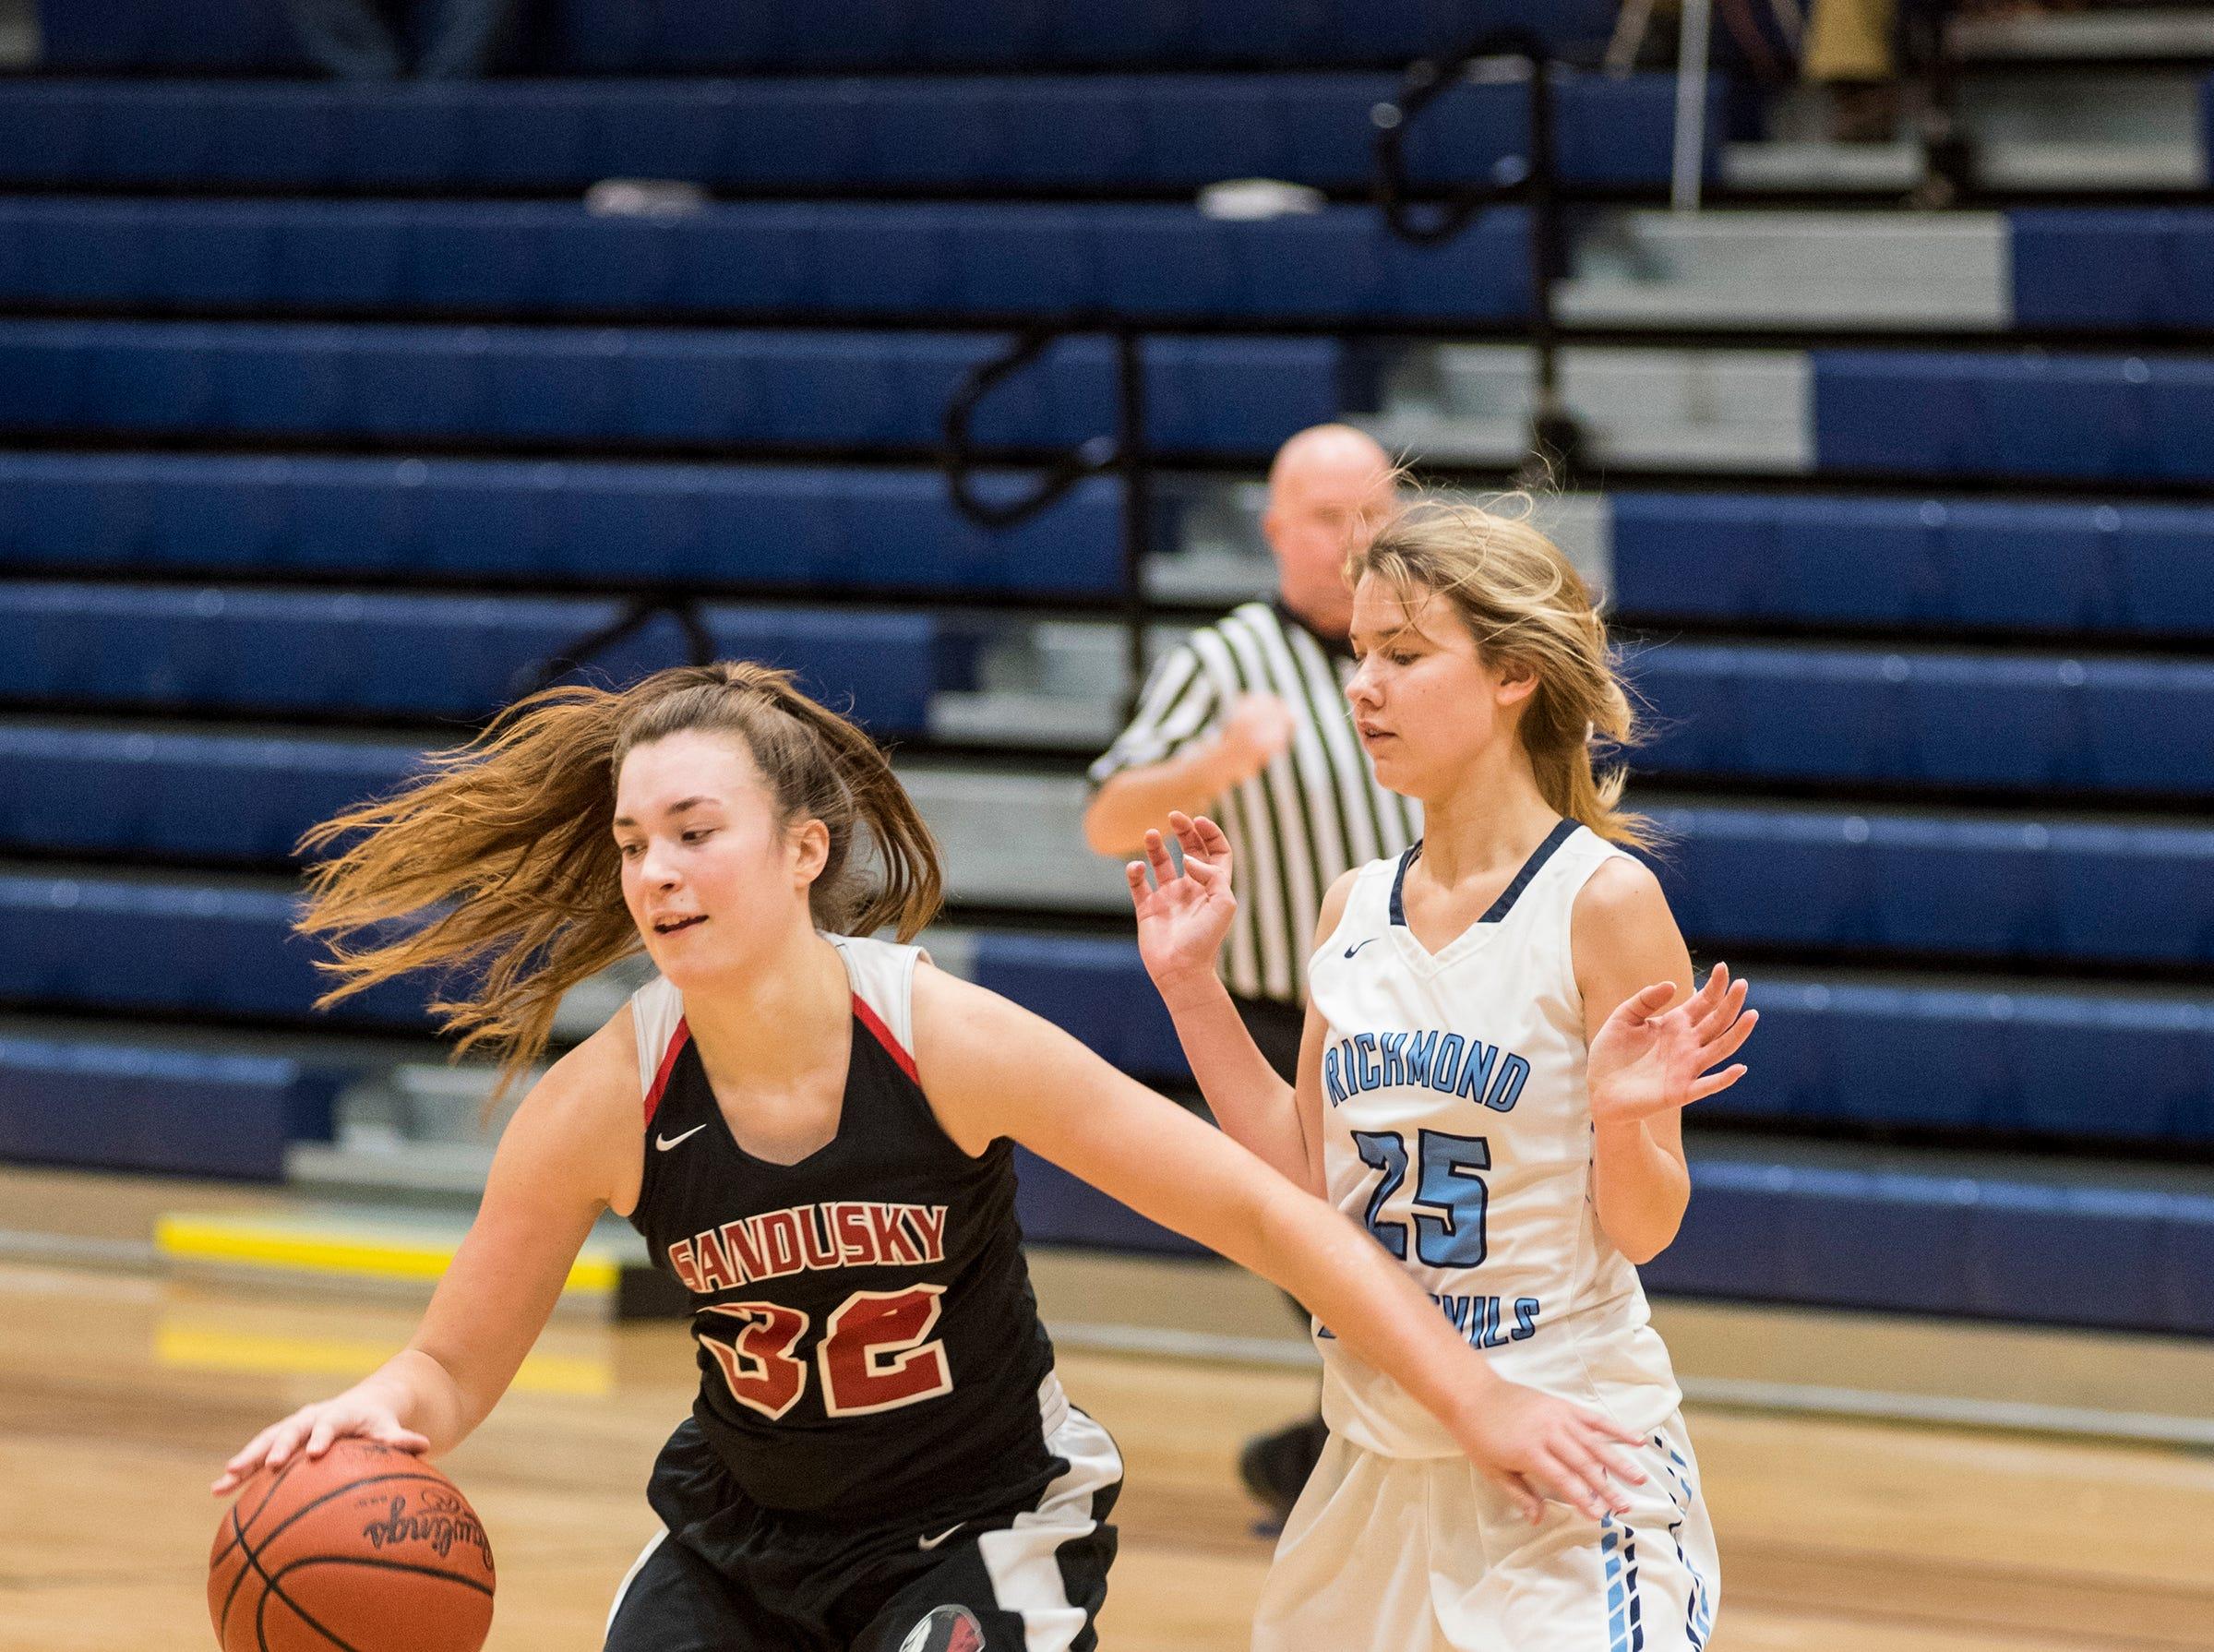 Richmond High School guanrd Jenna Schroeder (25) defends against Sandusky High School forward Gabby Gough during their SC4 Holiday Basketball Showcase game Thursday, Dec. 27, 2018 at the SC4 Fieldhouse.